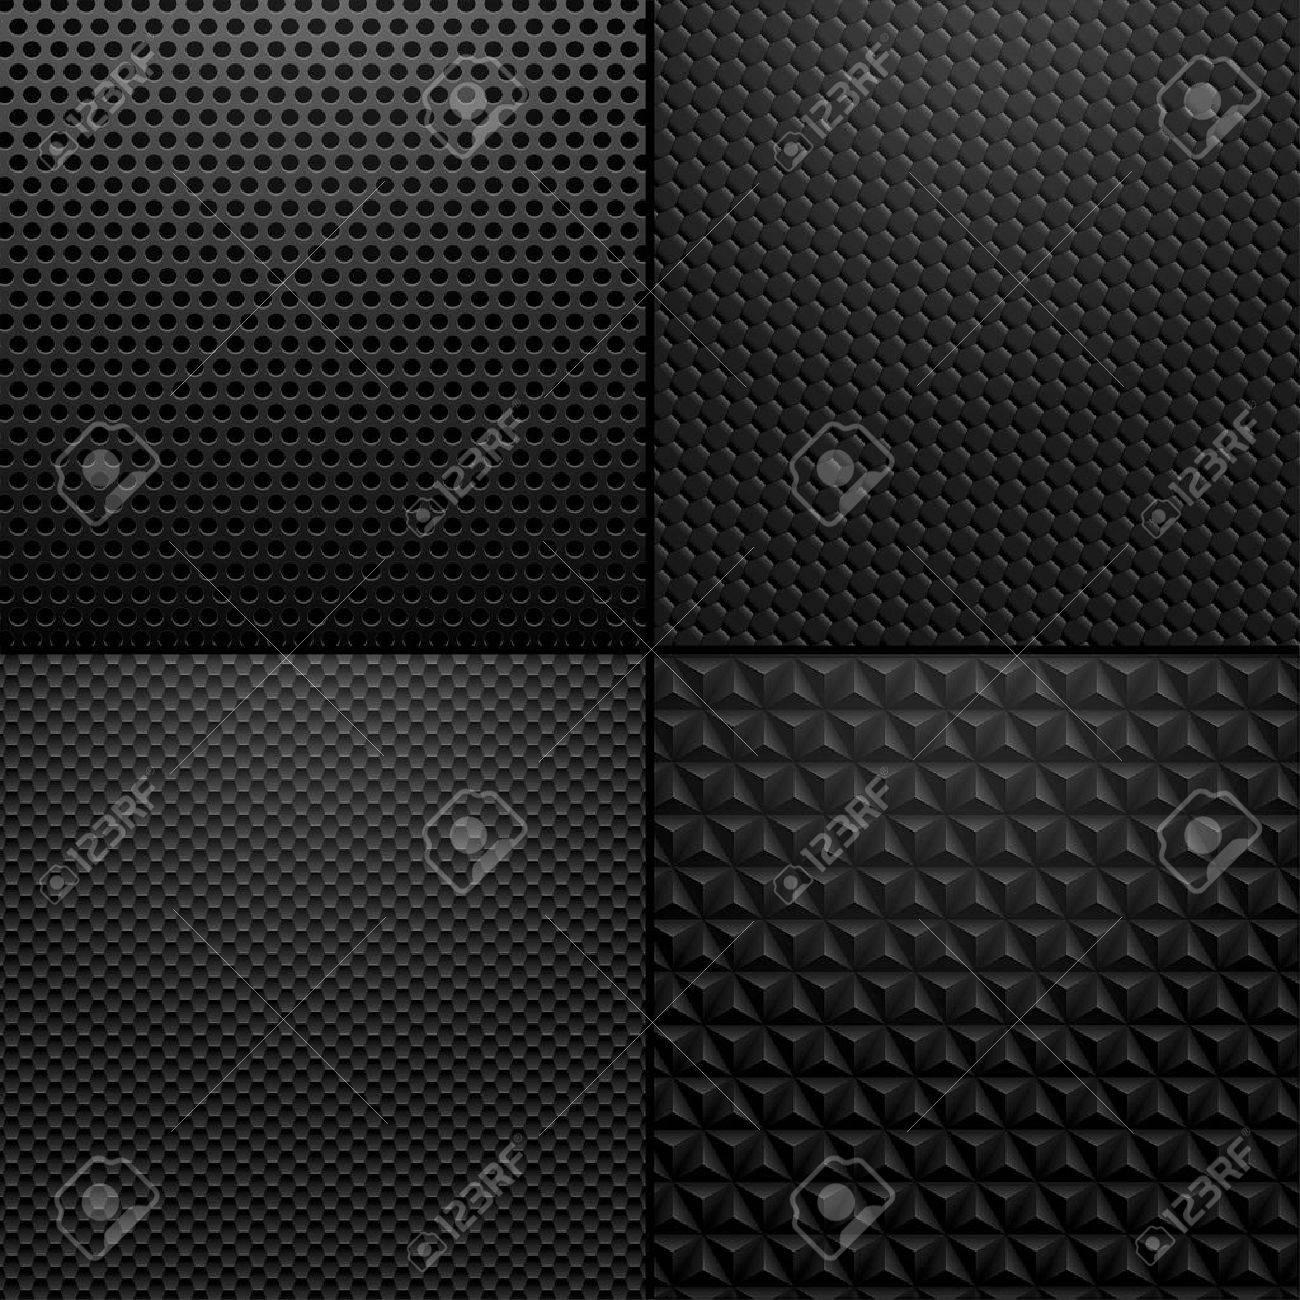 Carbon And Metallic Texture